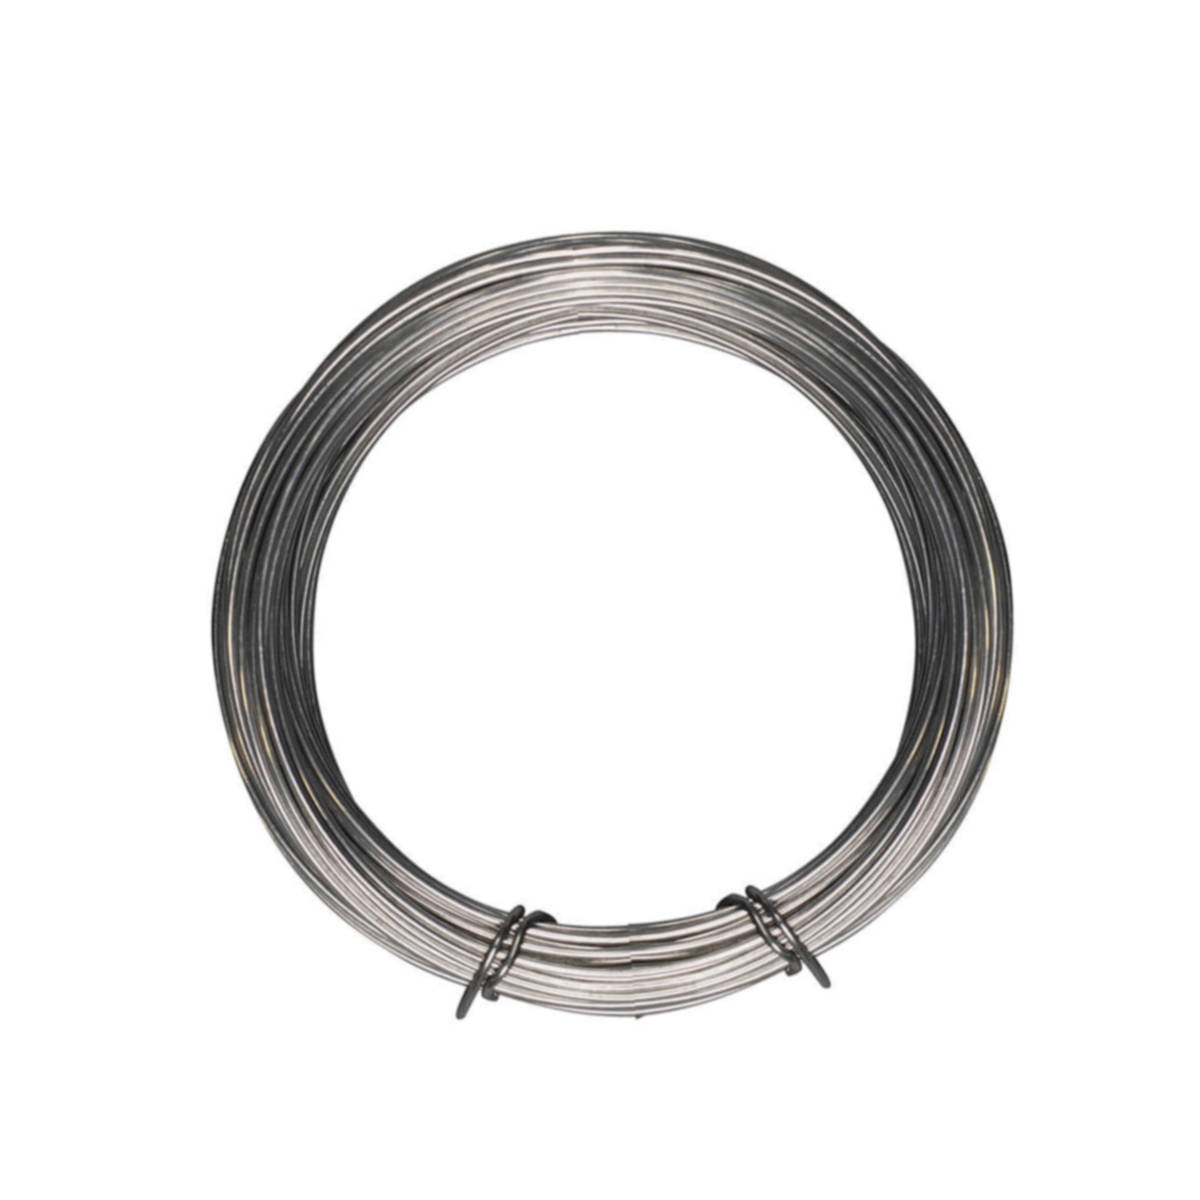 Ben-Mor Cables 93035